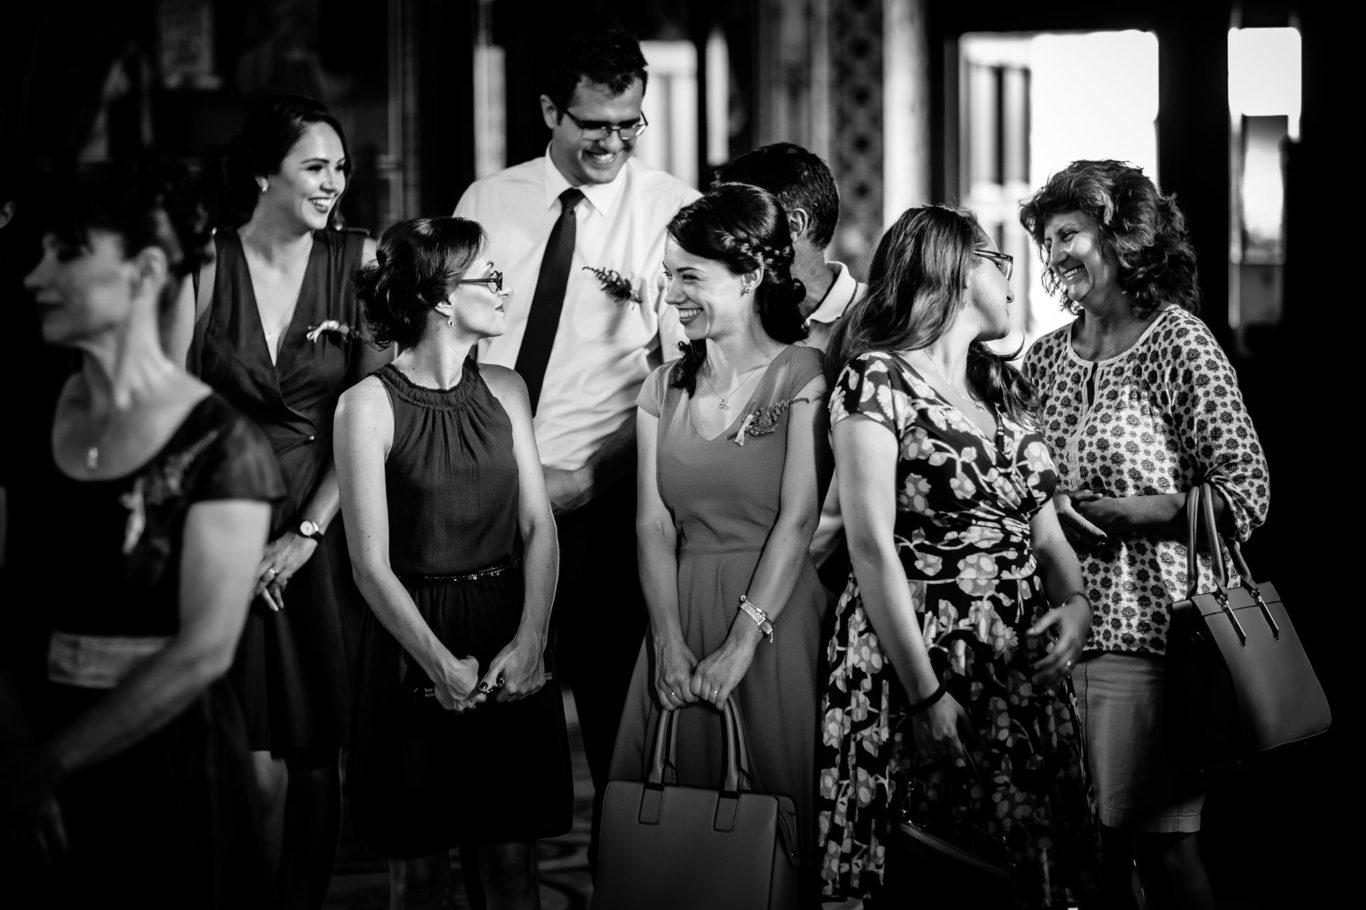 0364-fotografie-nunta-bucuresti-cristina-nicusor-fotograf-ciprian-dumitrescu-cd2_0468